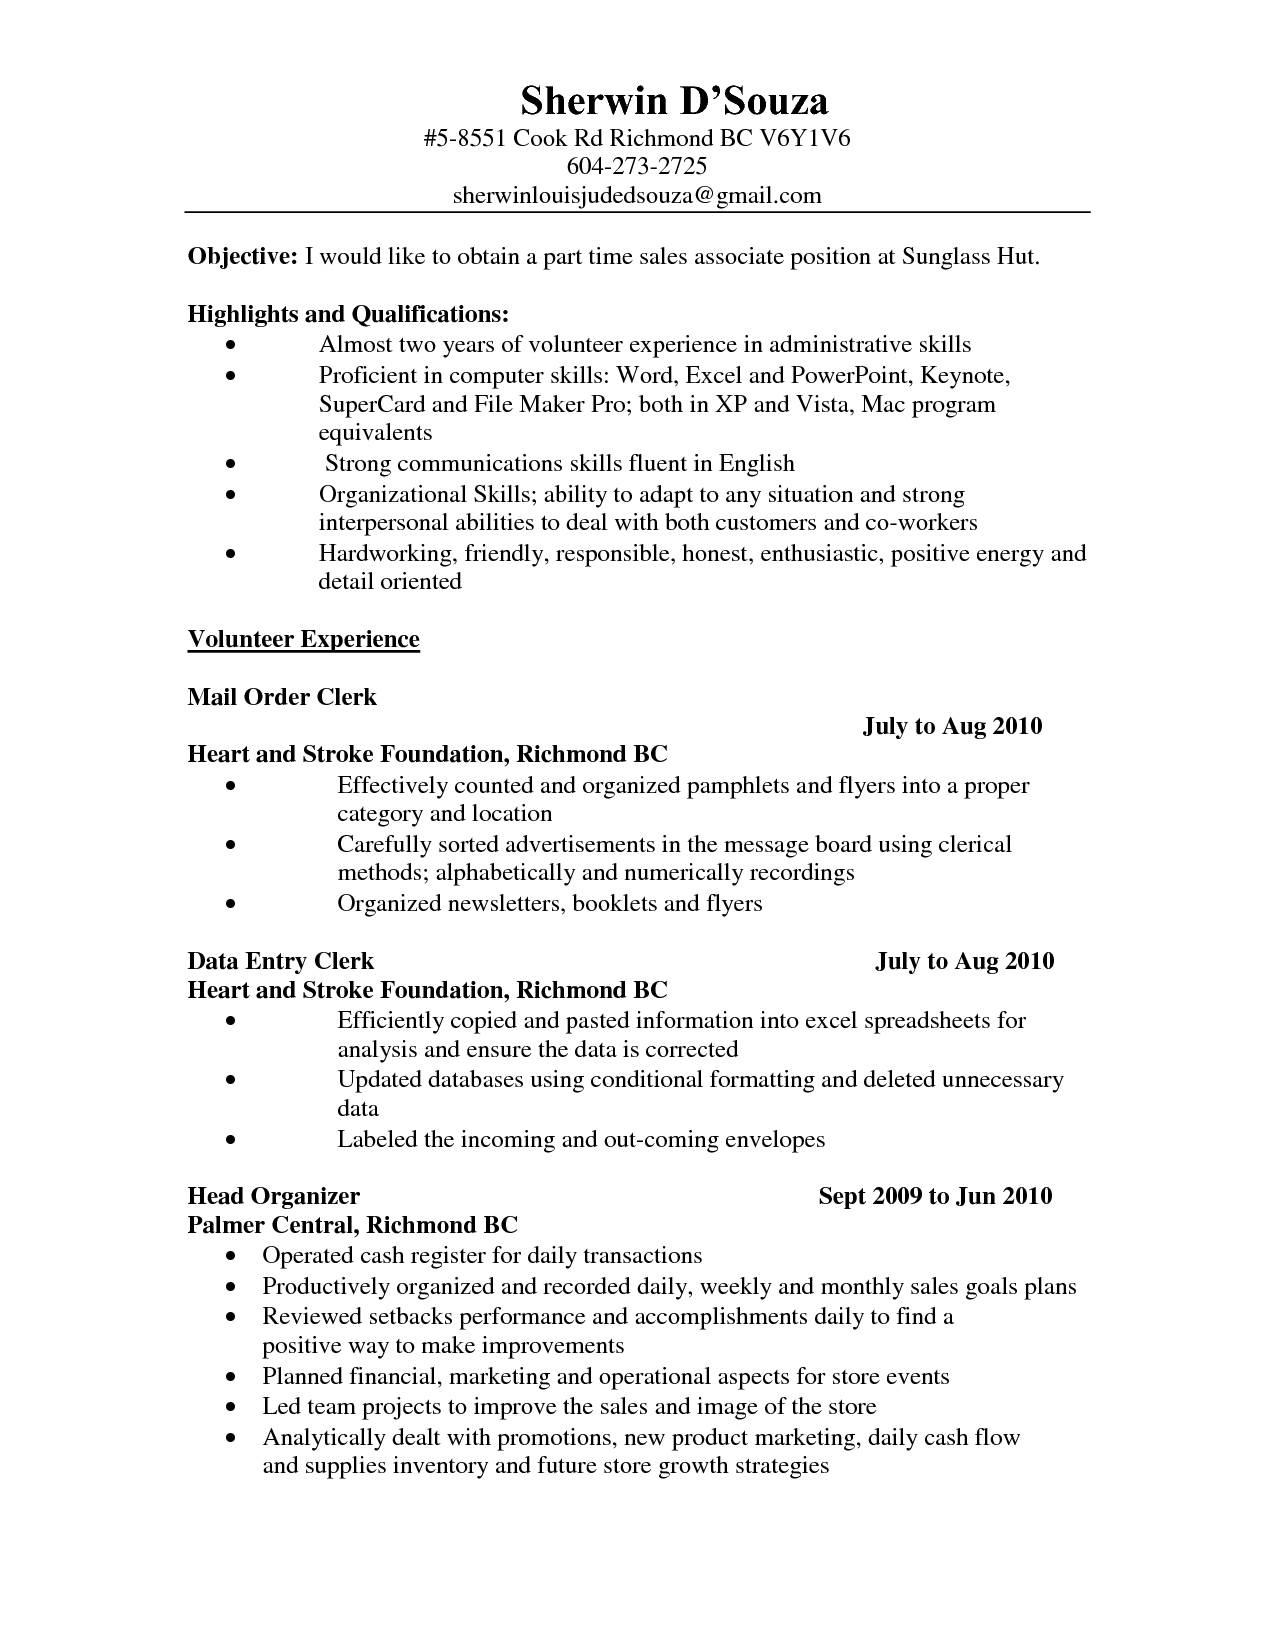 10 Trendy Ideas For Part Time Jobs mcdonalds cook job description resume best of brilliant ideas sample 2021